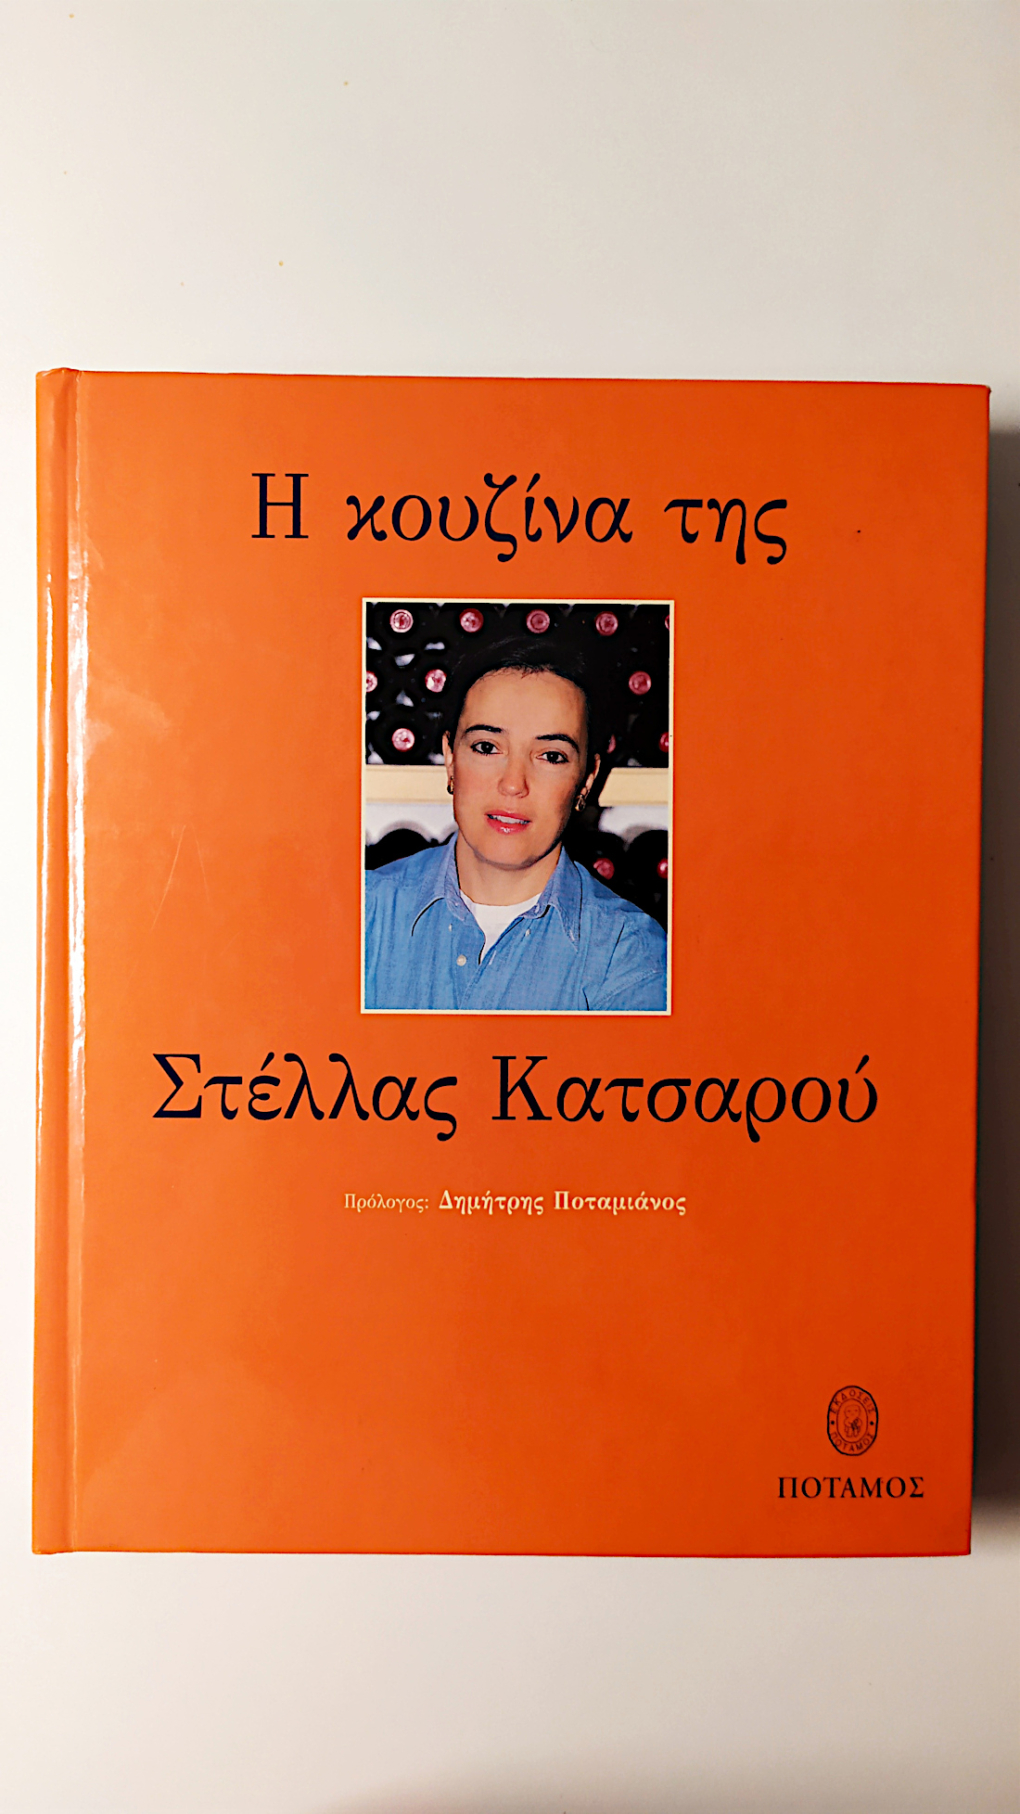 H-kouzina-stellas-katsarou-4